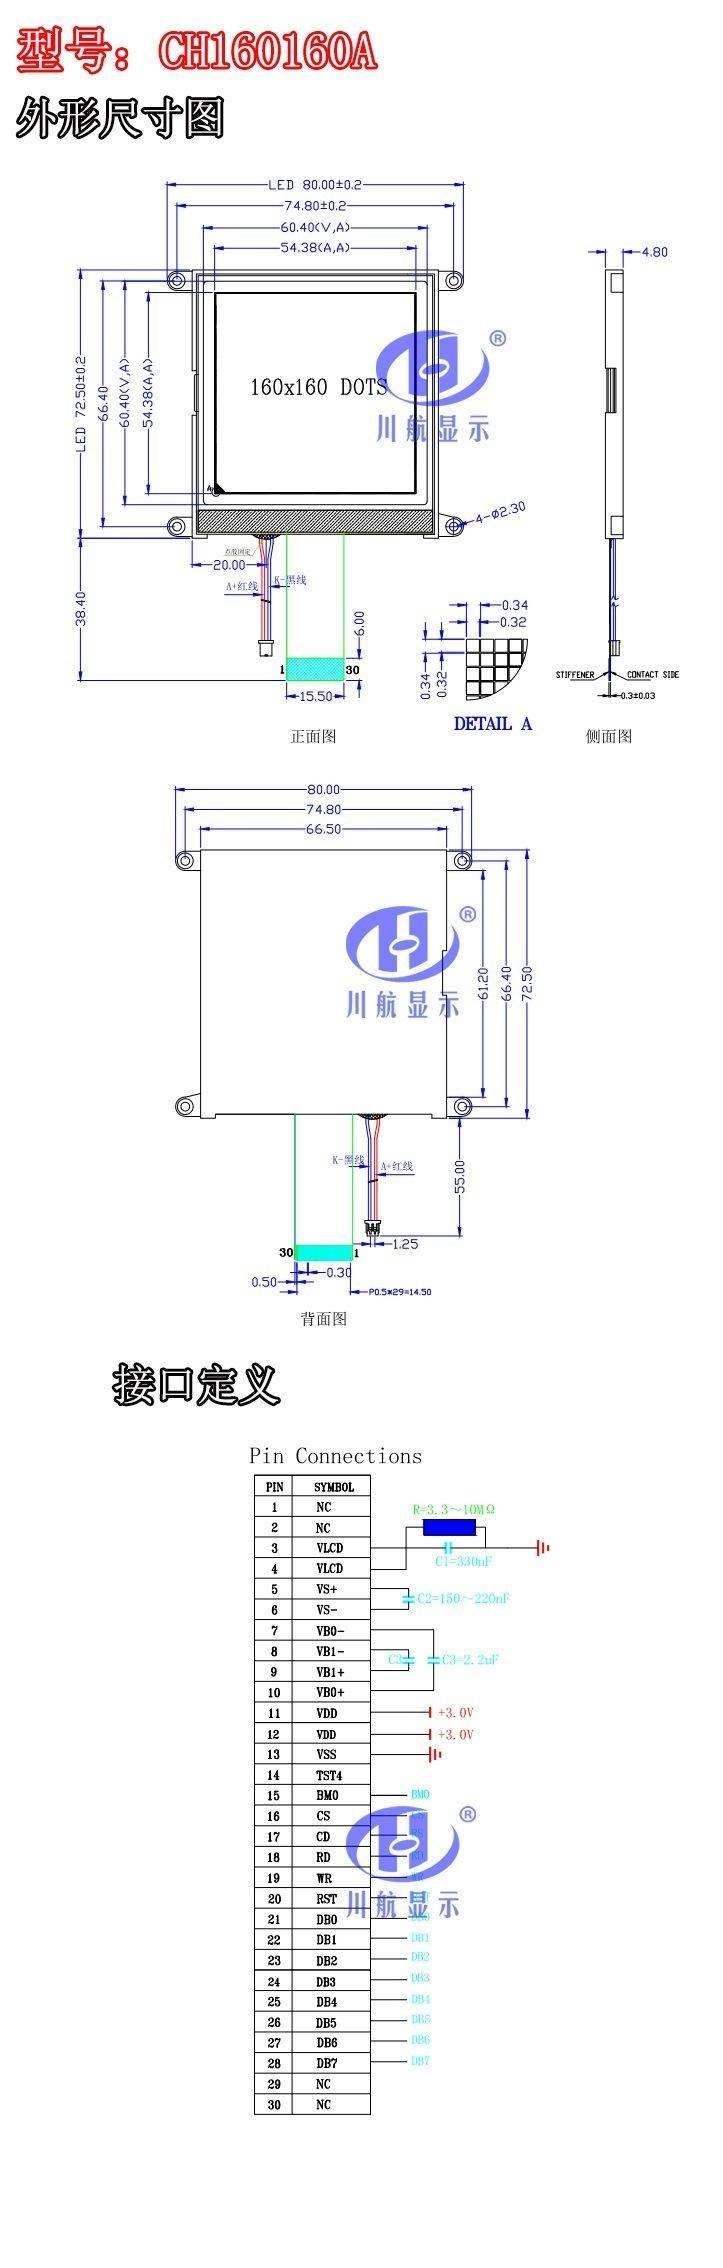 CH160160A參數說明 (2)